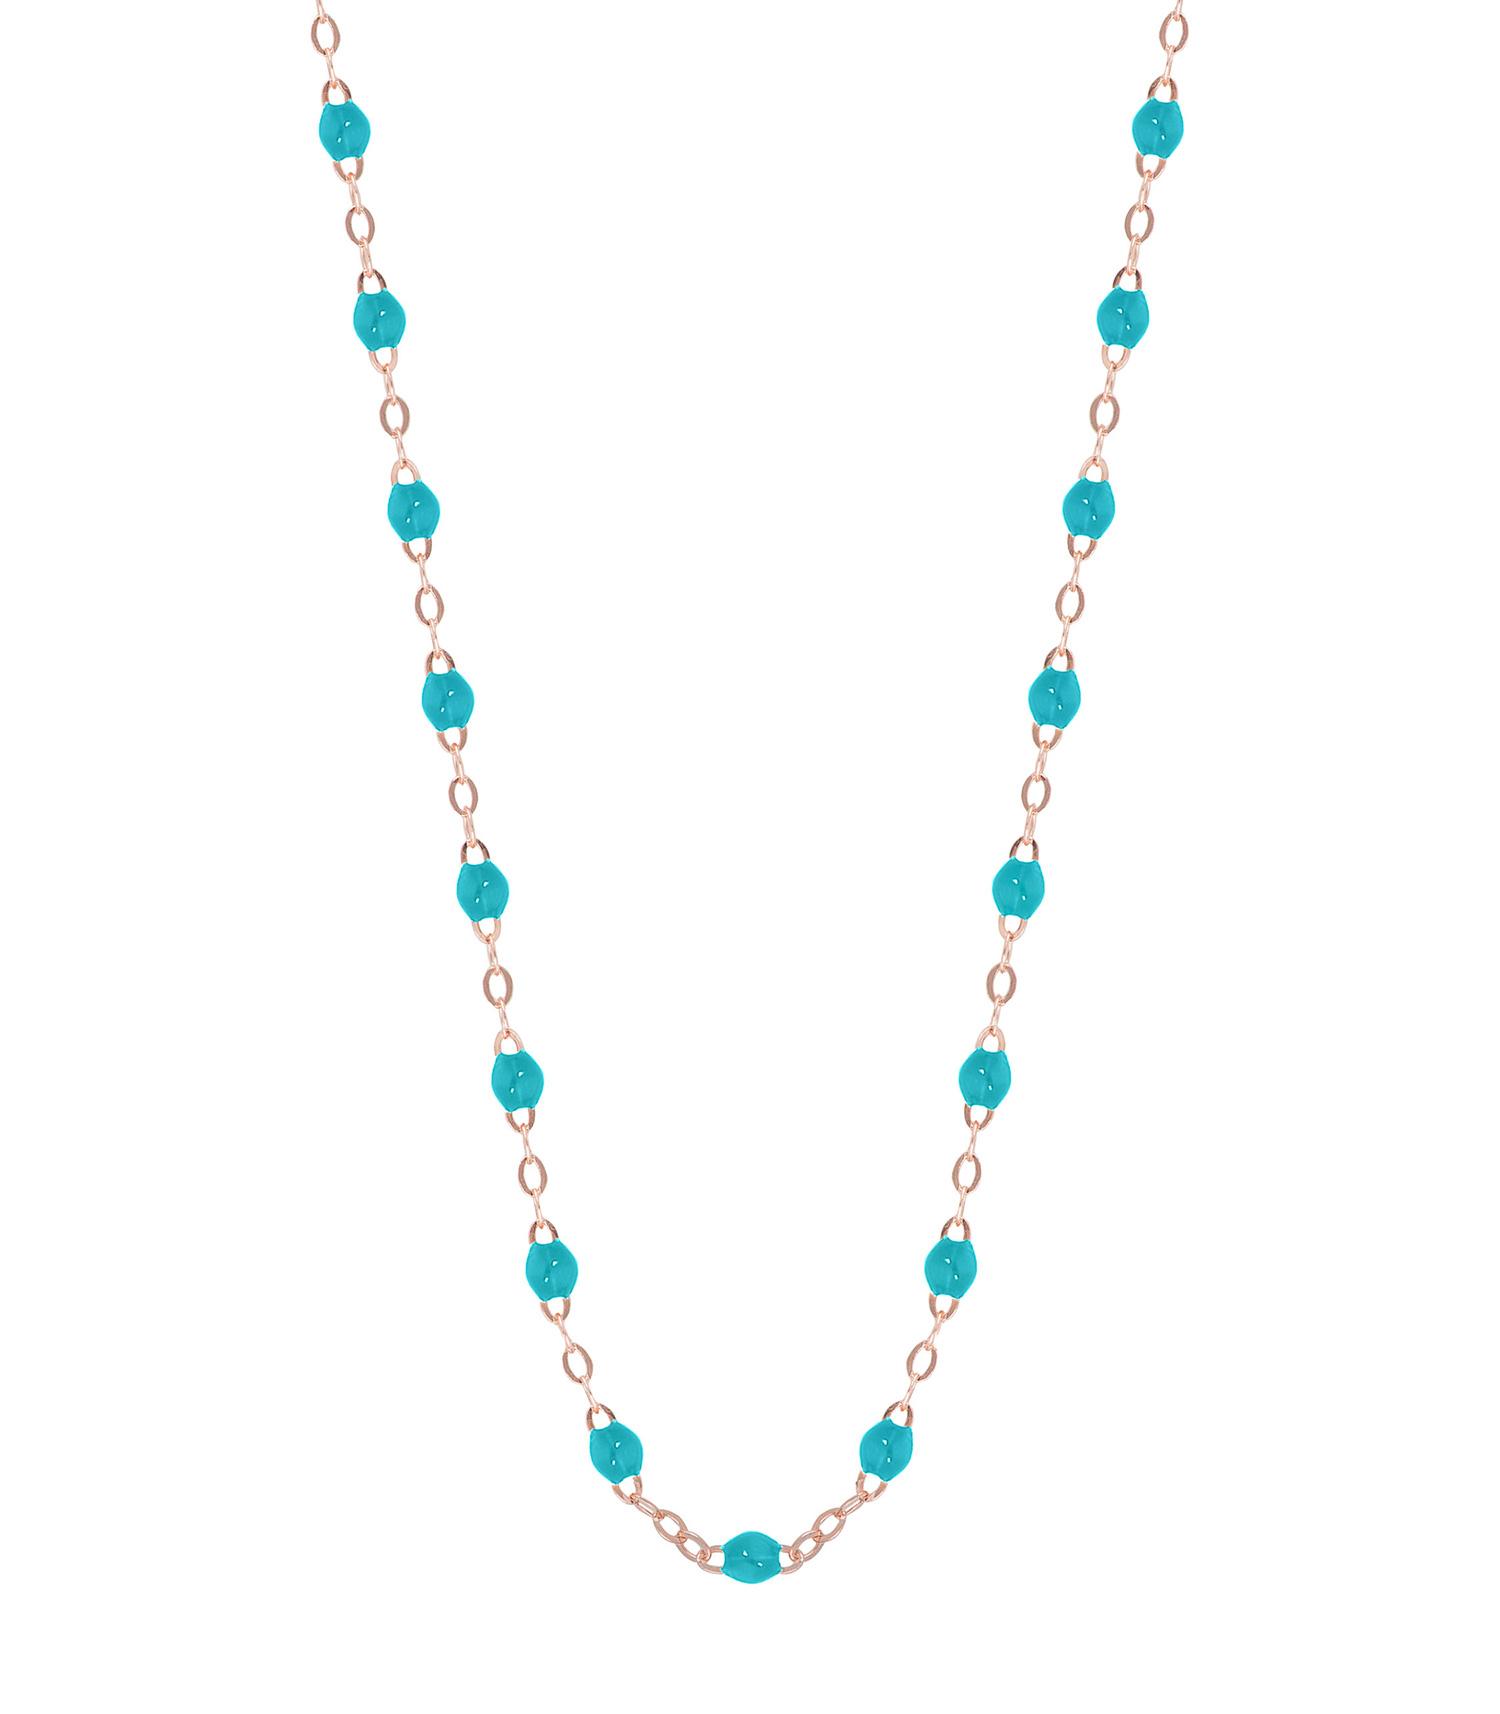 collier perle imitation gigi clozeau